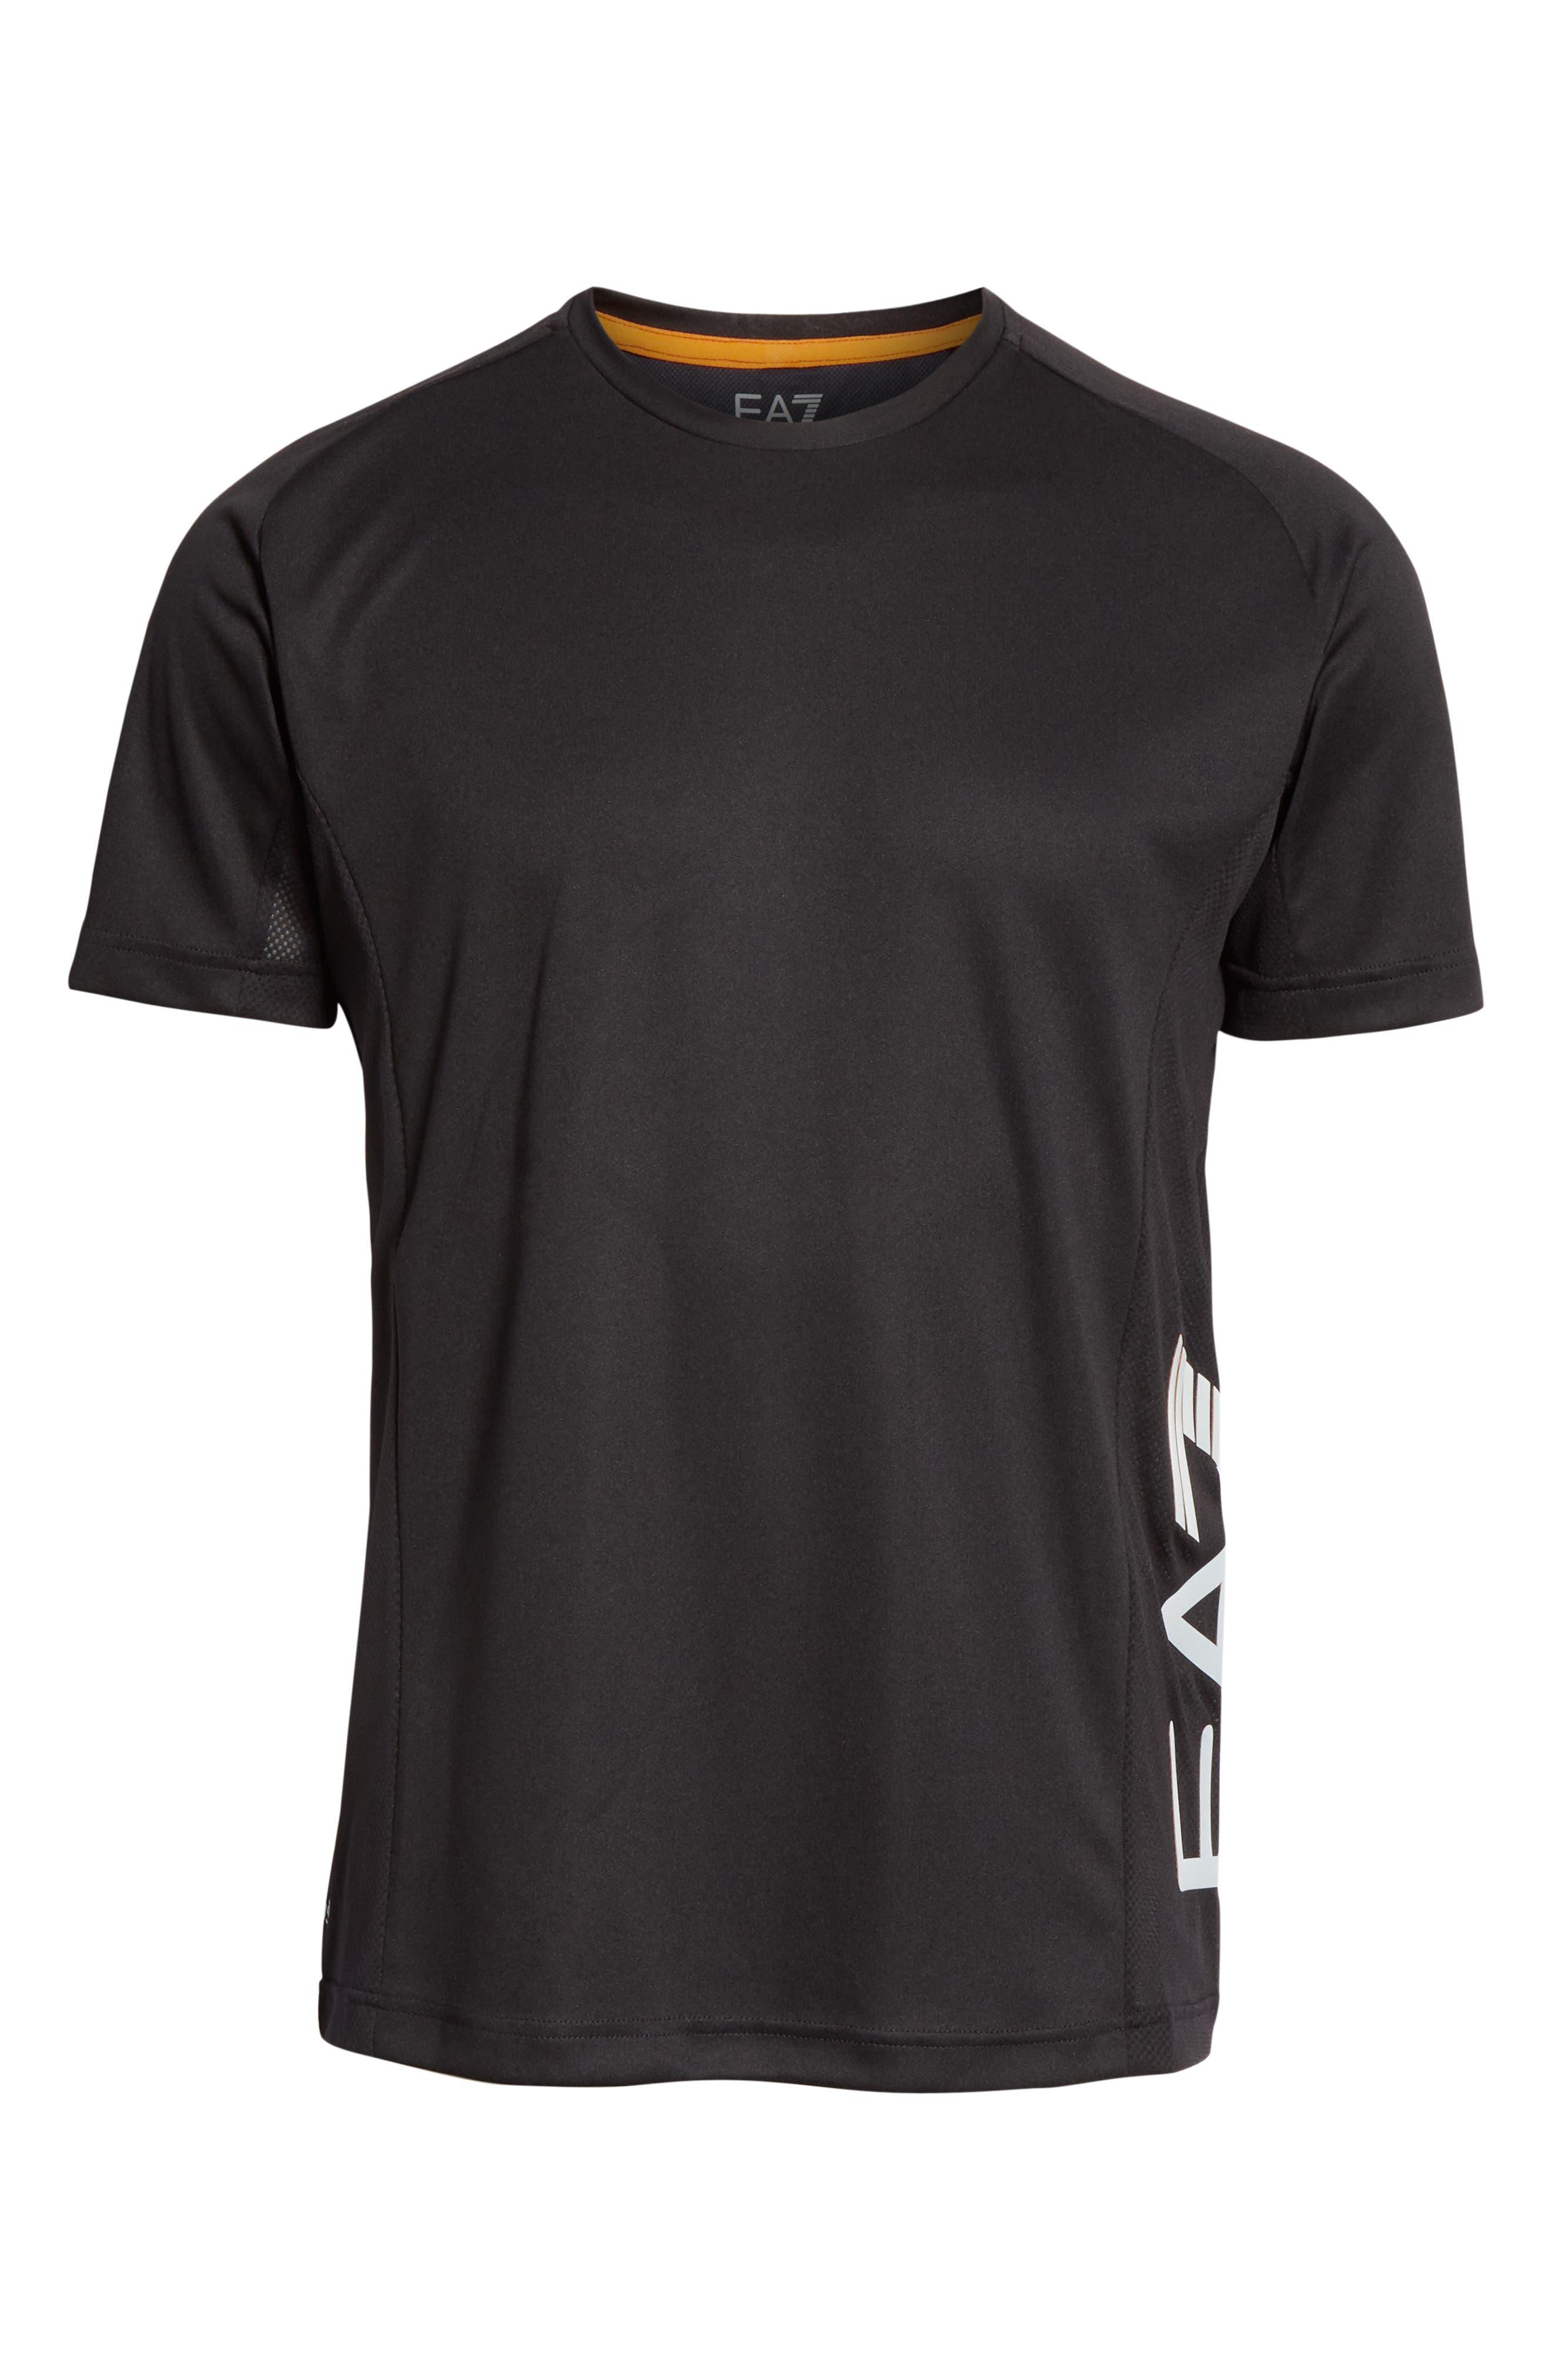 Ventus Crewneck T-Shirt,                             Alternate thumbnail 5, color,                             BLACK